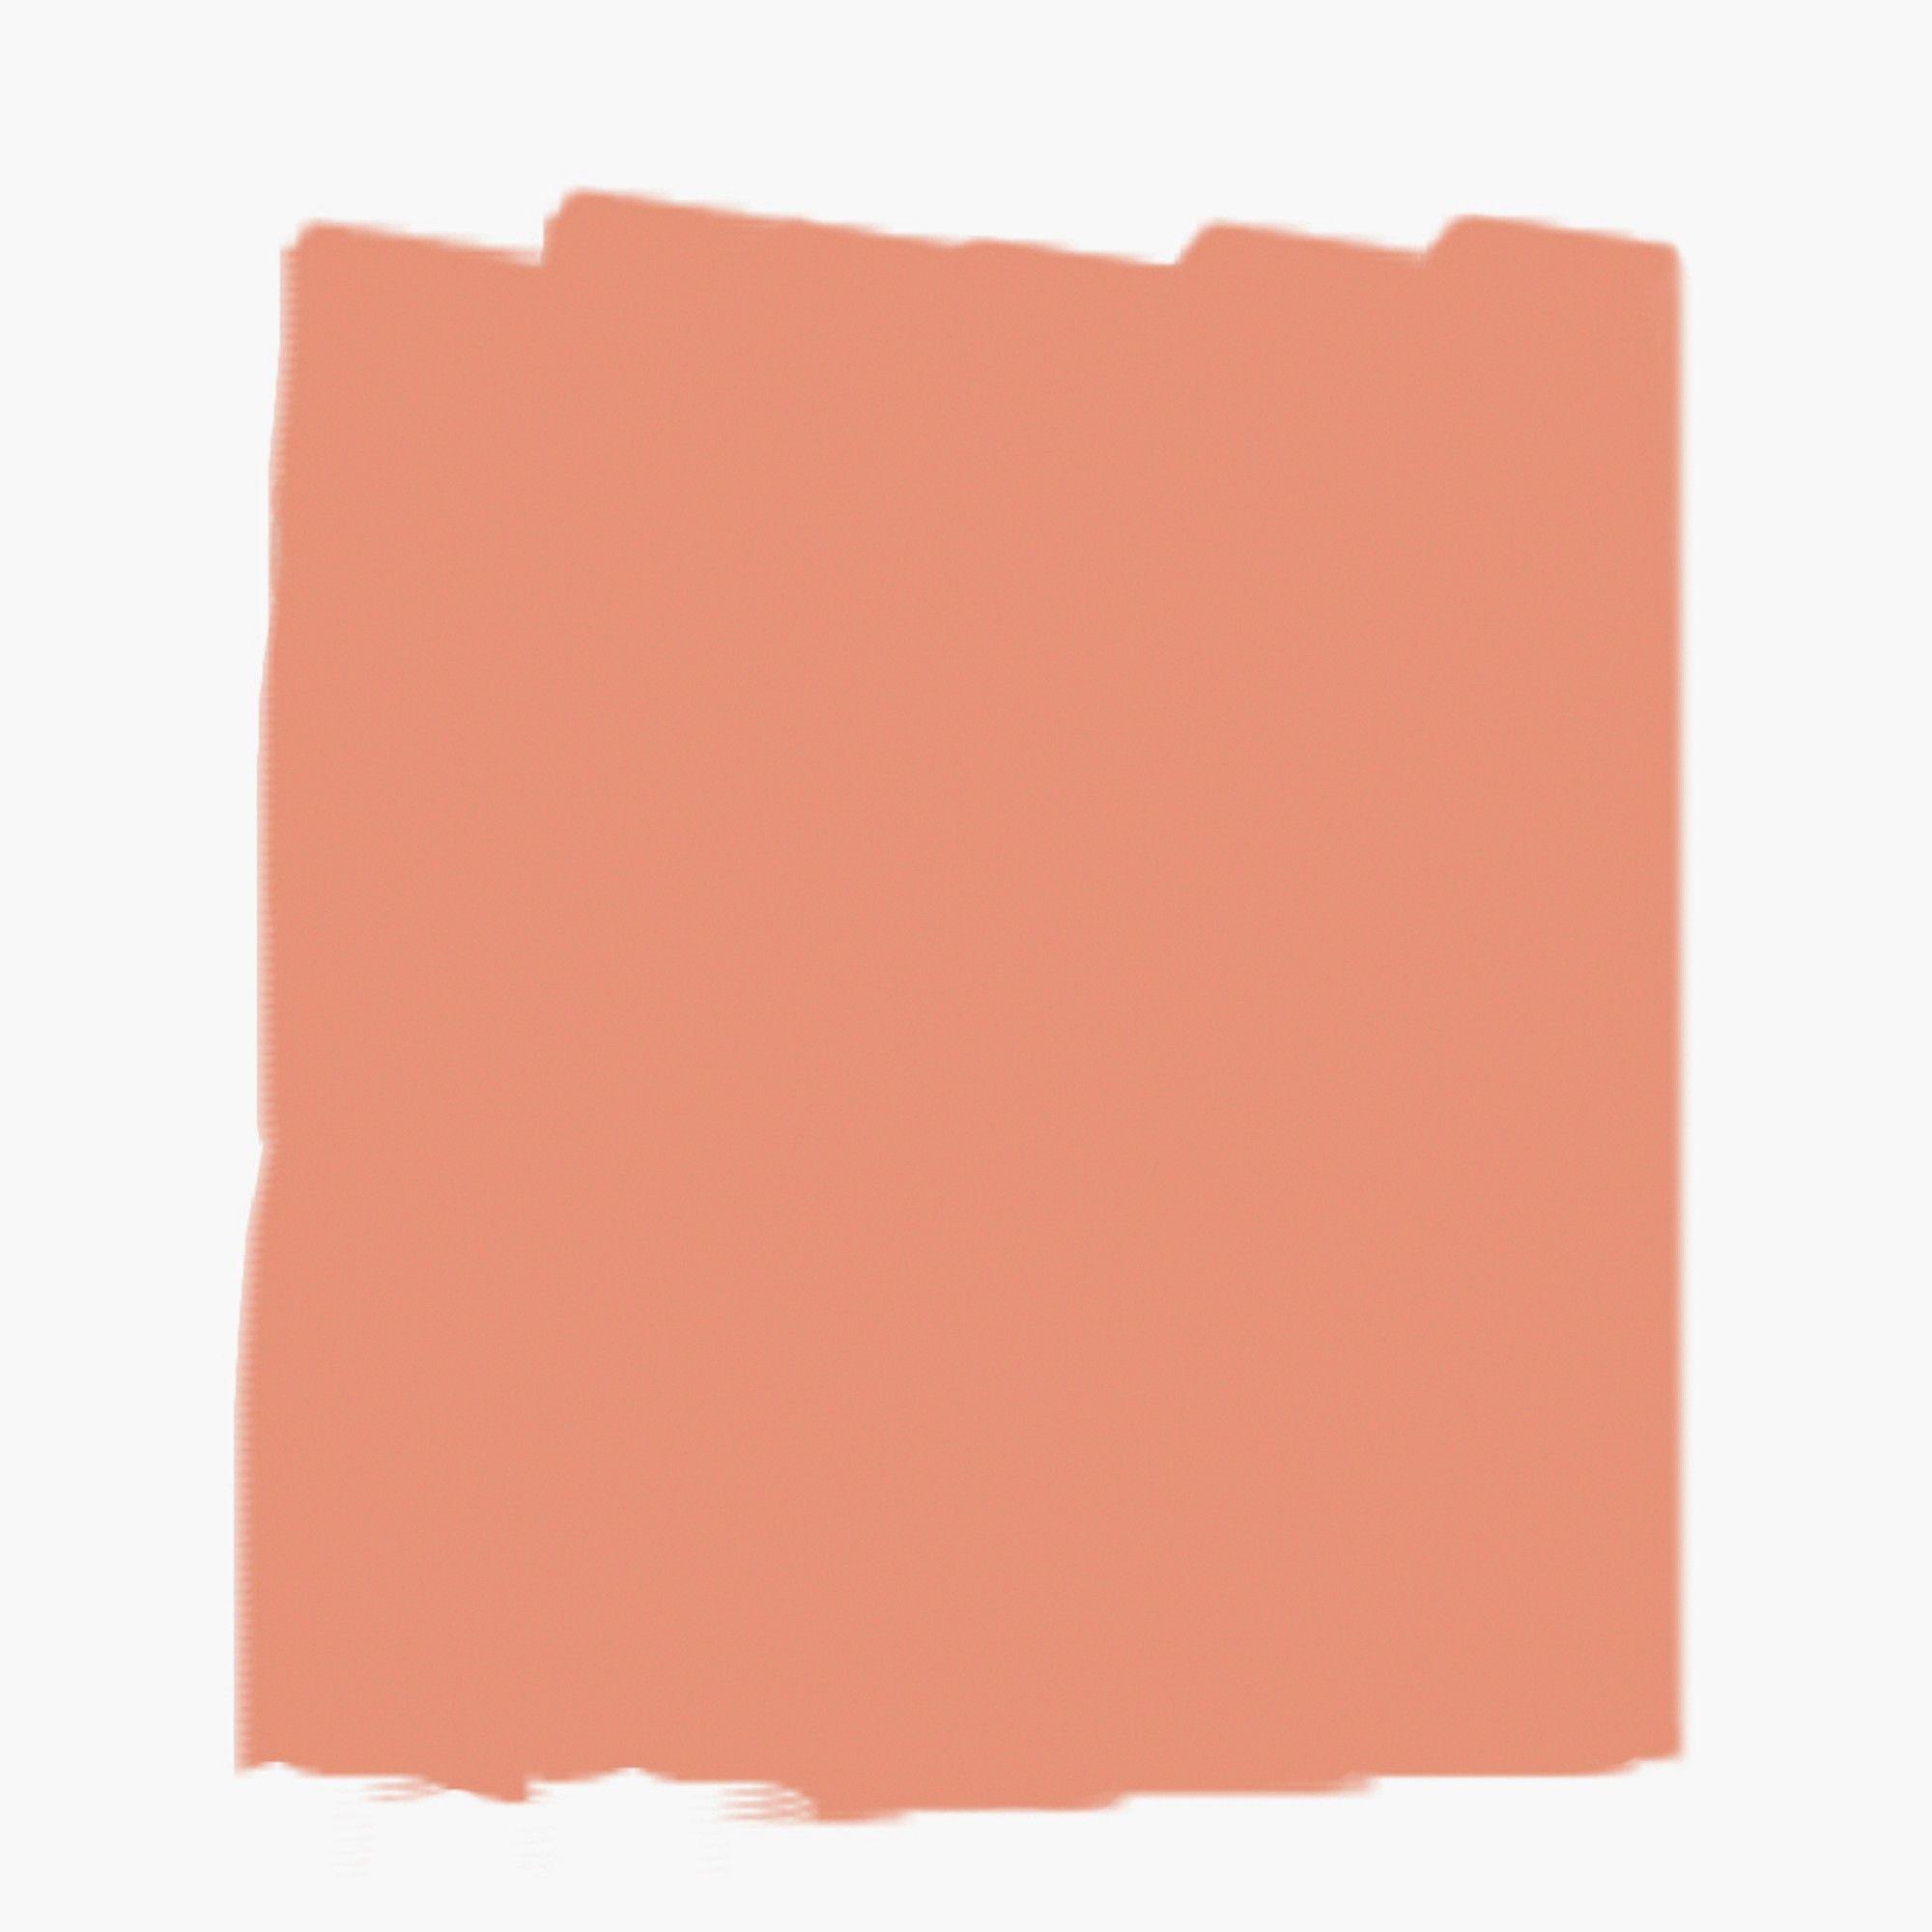 peinture saumon taupe - Recherche Google